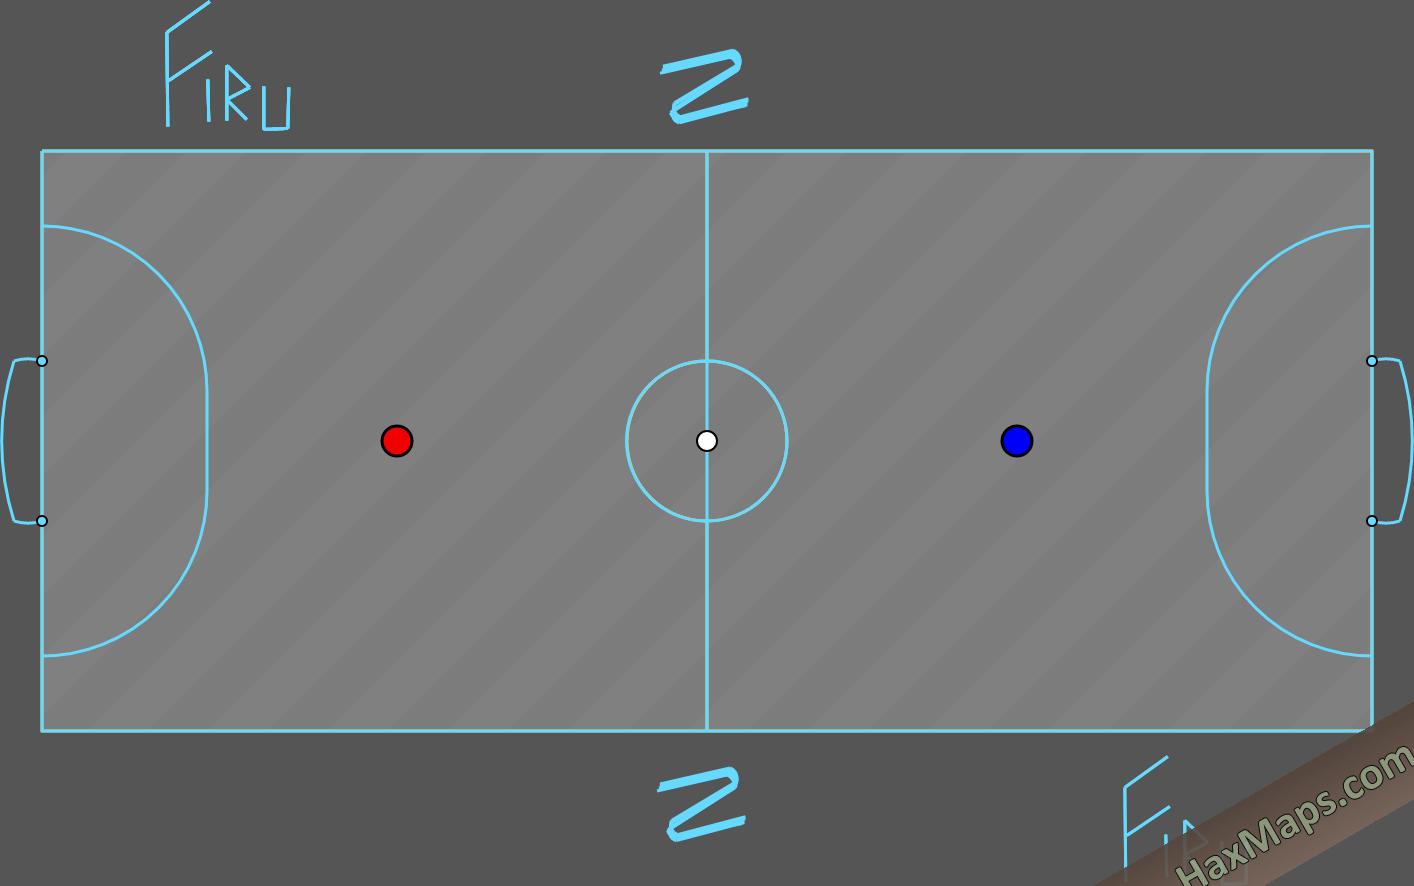 haxball maps | FutsalBounce Firuleiro By ☡onic